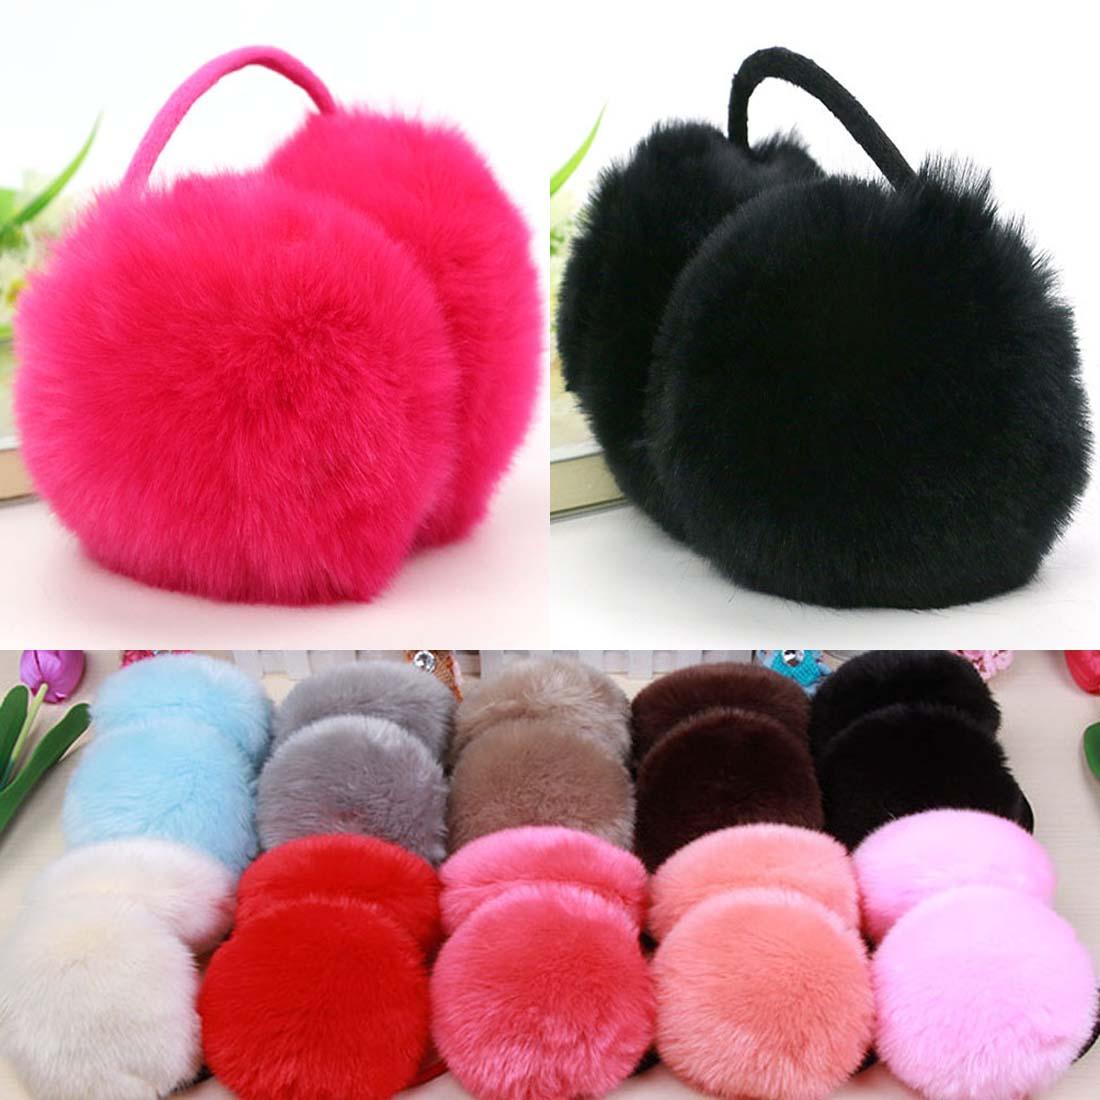 Winter Earmuff Imitation Rabbit Women Fur Earmuffs Winter Ear Warmers Large Plush Girls And Boys Ear Warmers Earmuffs